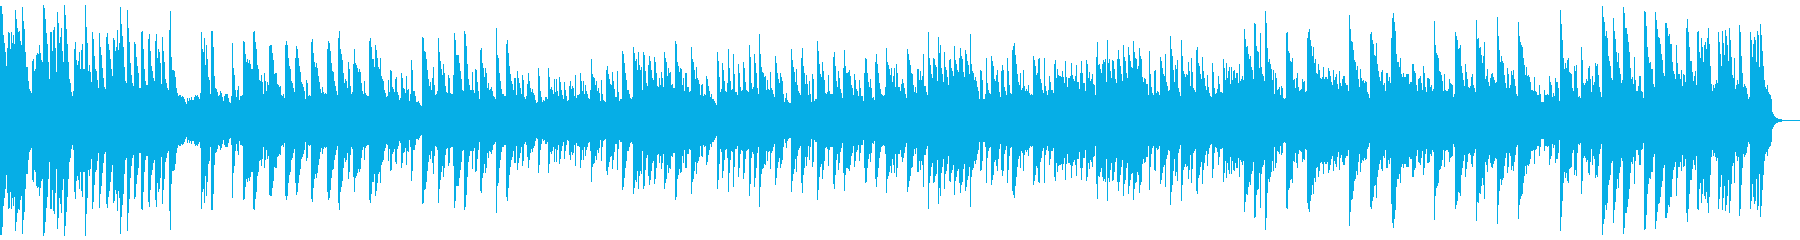 8bit ファンタジーな航海 ショート版の再生済みの波形